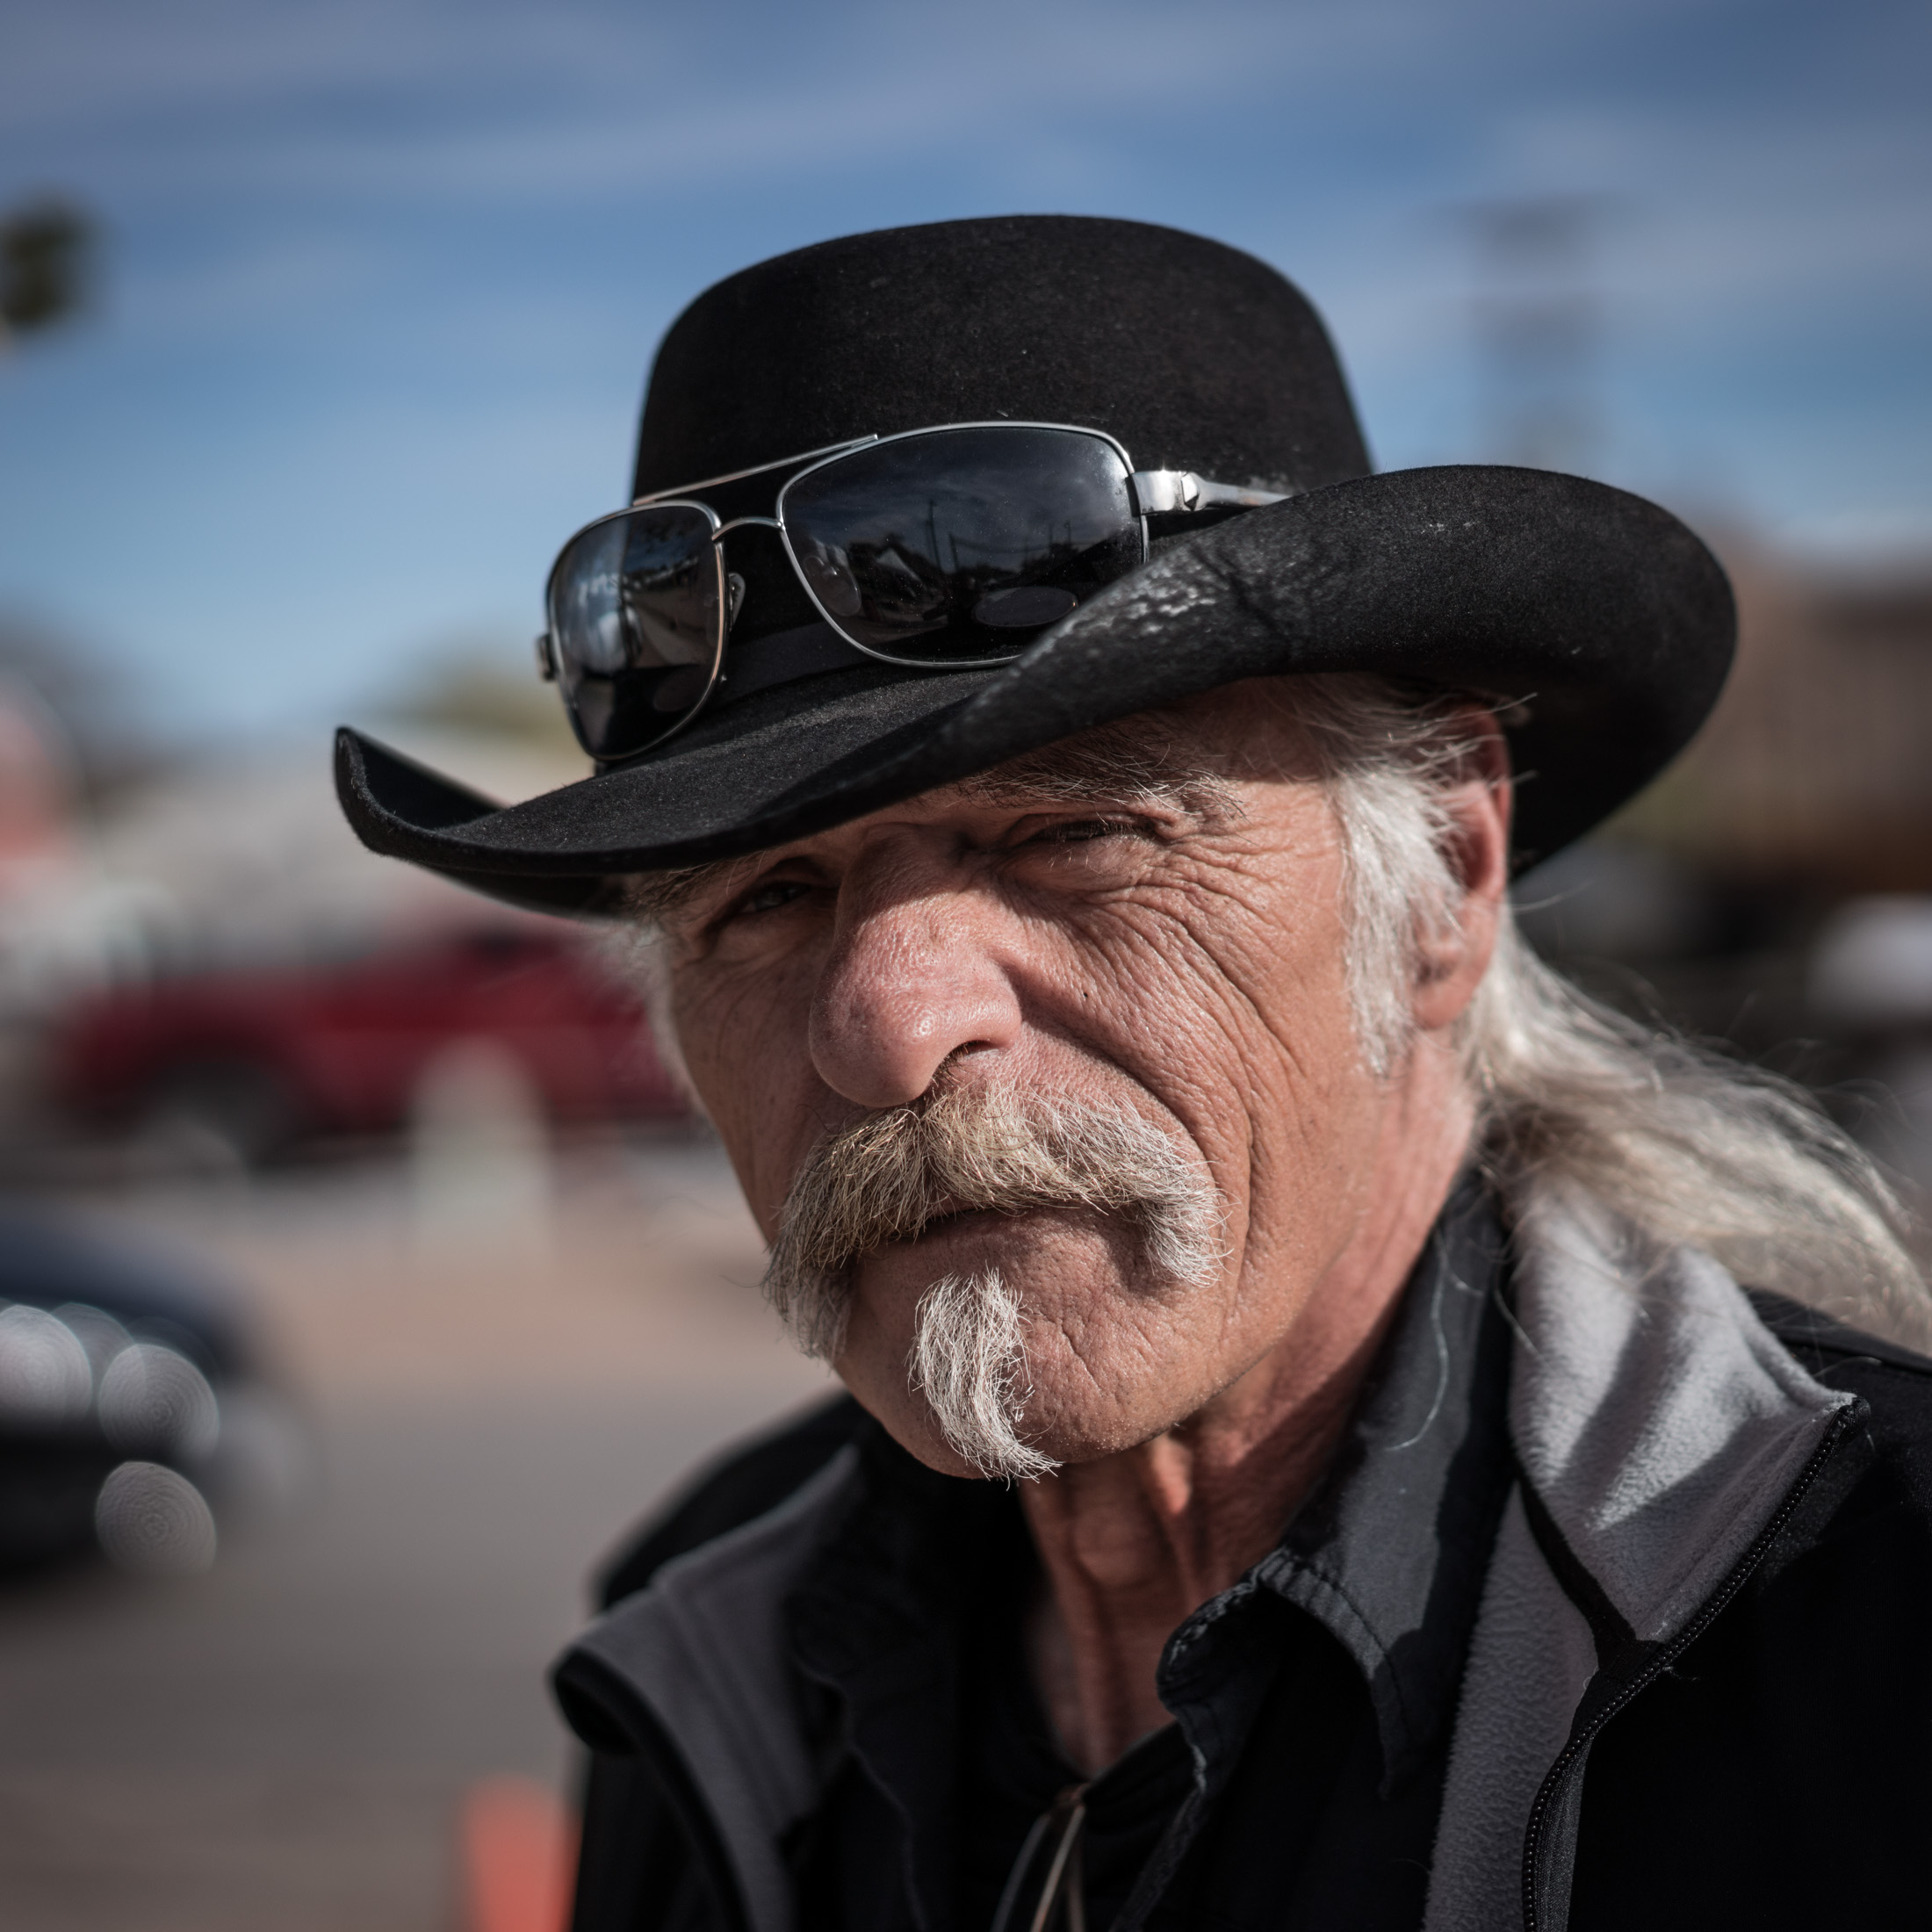 USA, Portraits, cowboy